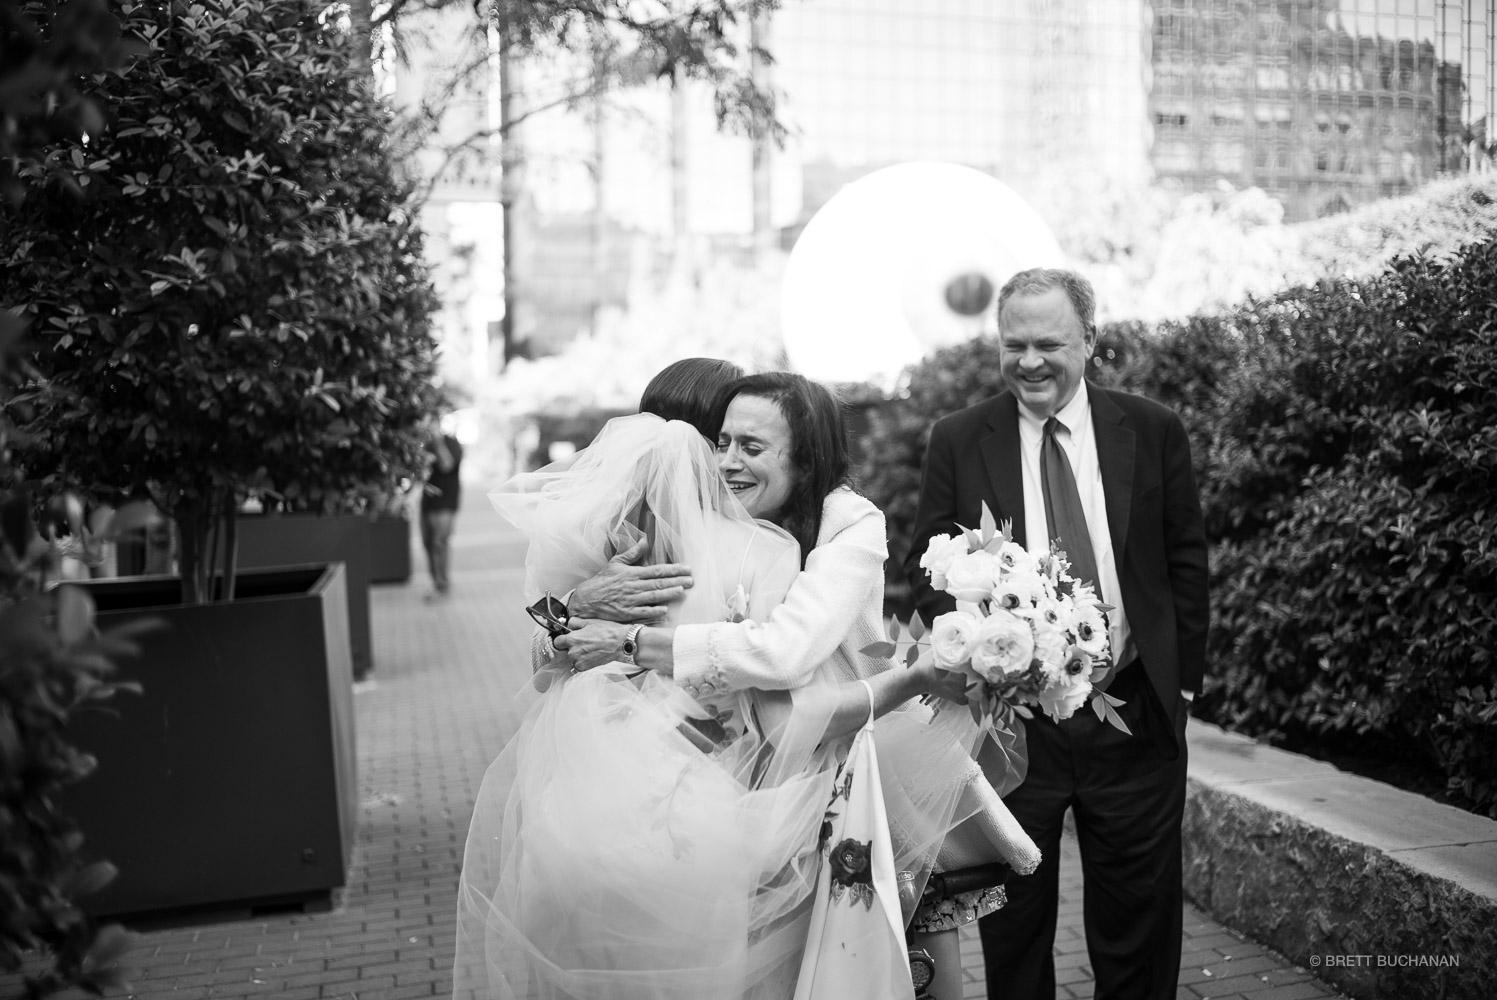 Austin-wedding-photographer-dallas-eyeball-joule-41